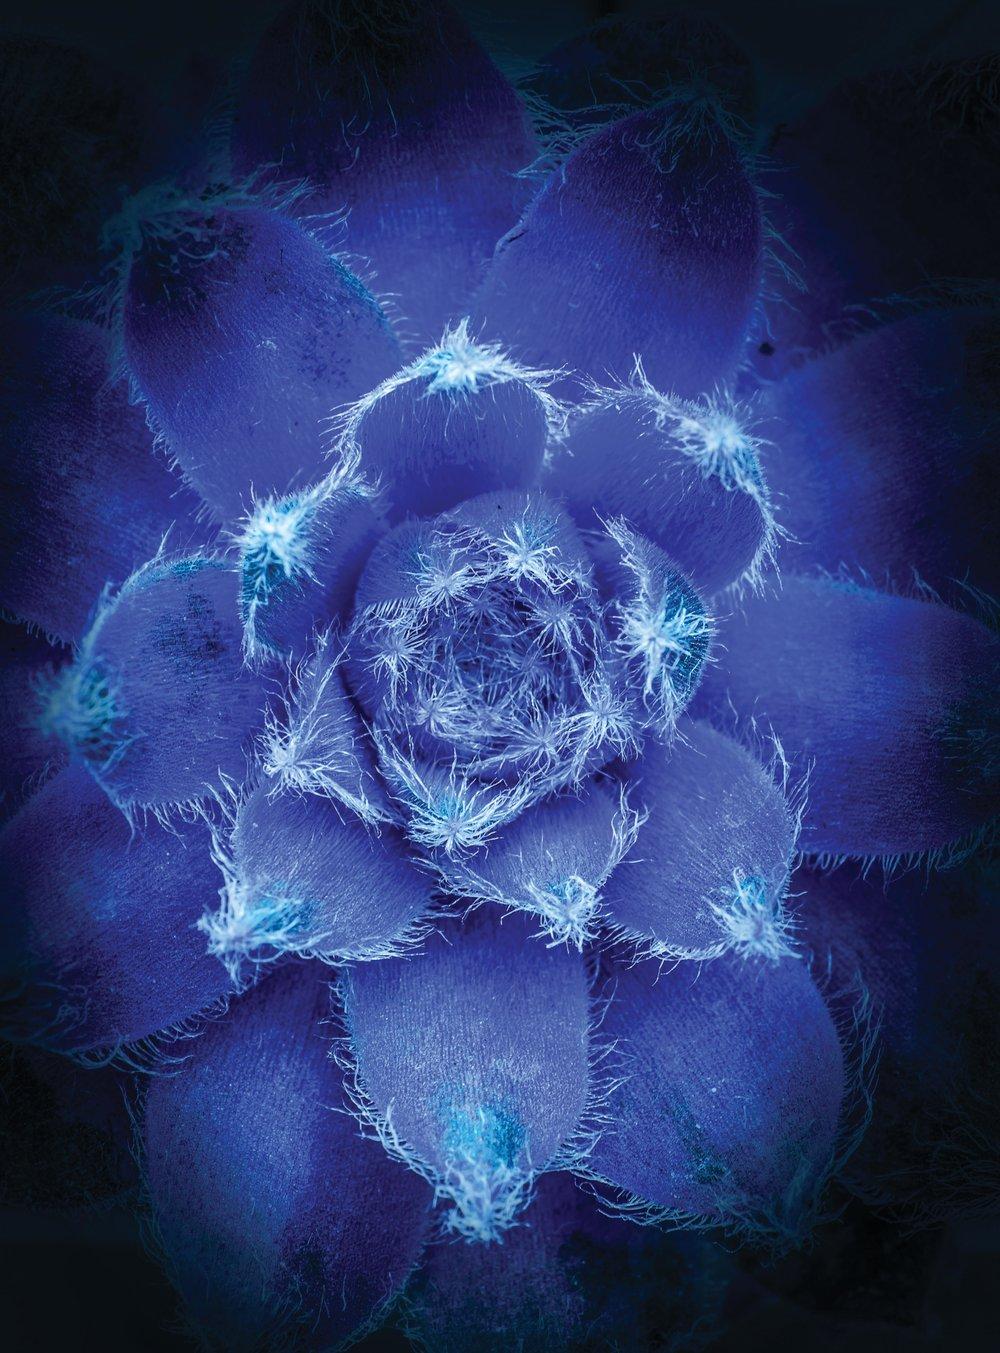 Blue_Heart_CMYK.jpg